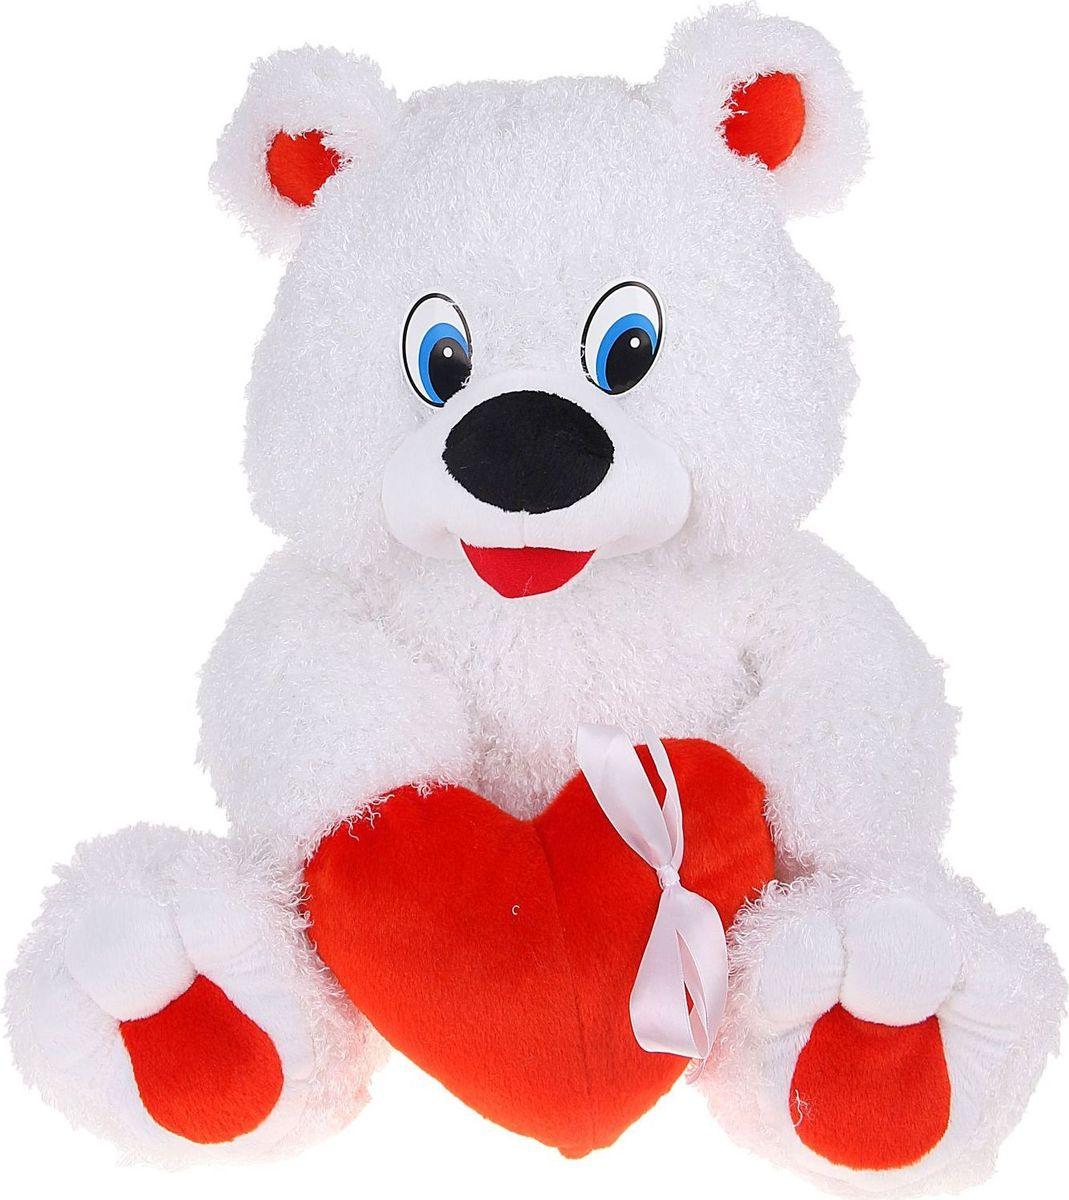 Sima-land Мягкая игрушка Медвежонок Романтик 52 см малышарики мягкая игрушка собака бассет хаунд 23 см